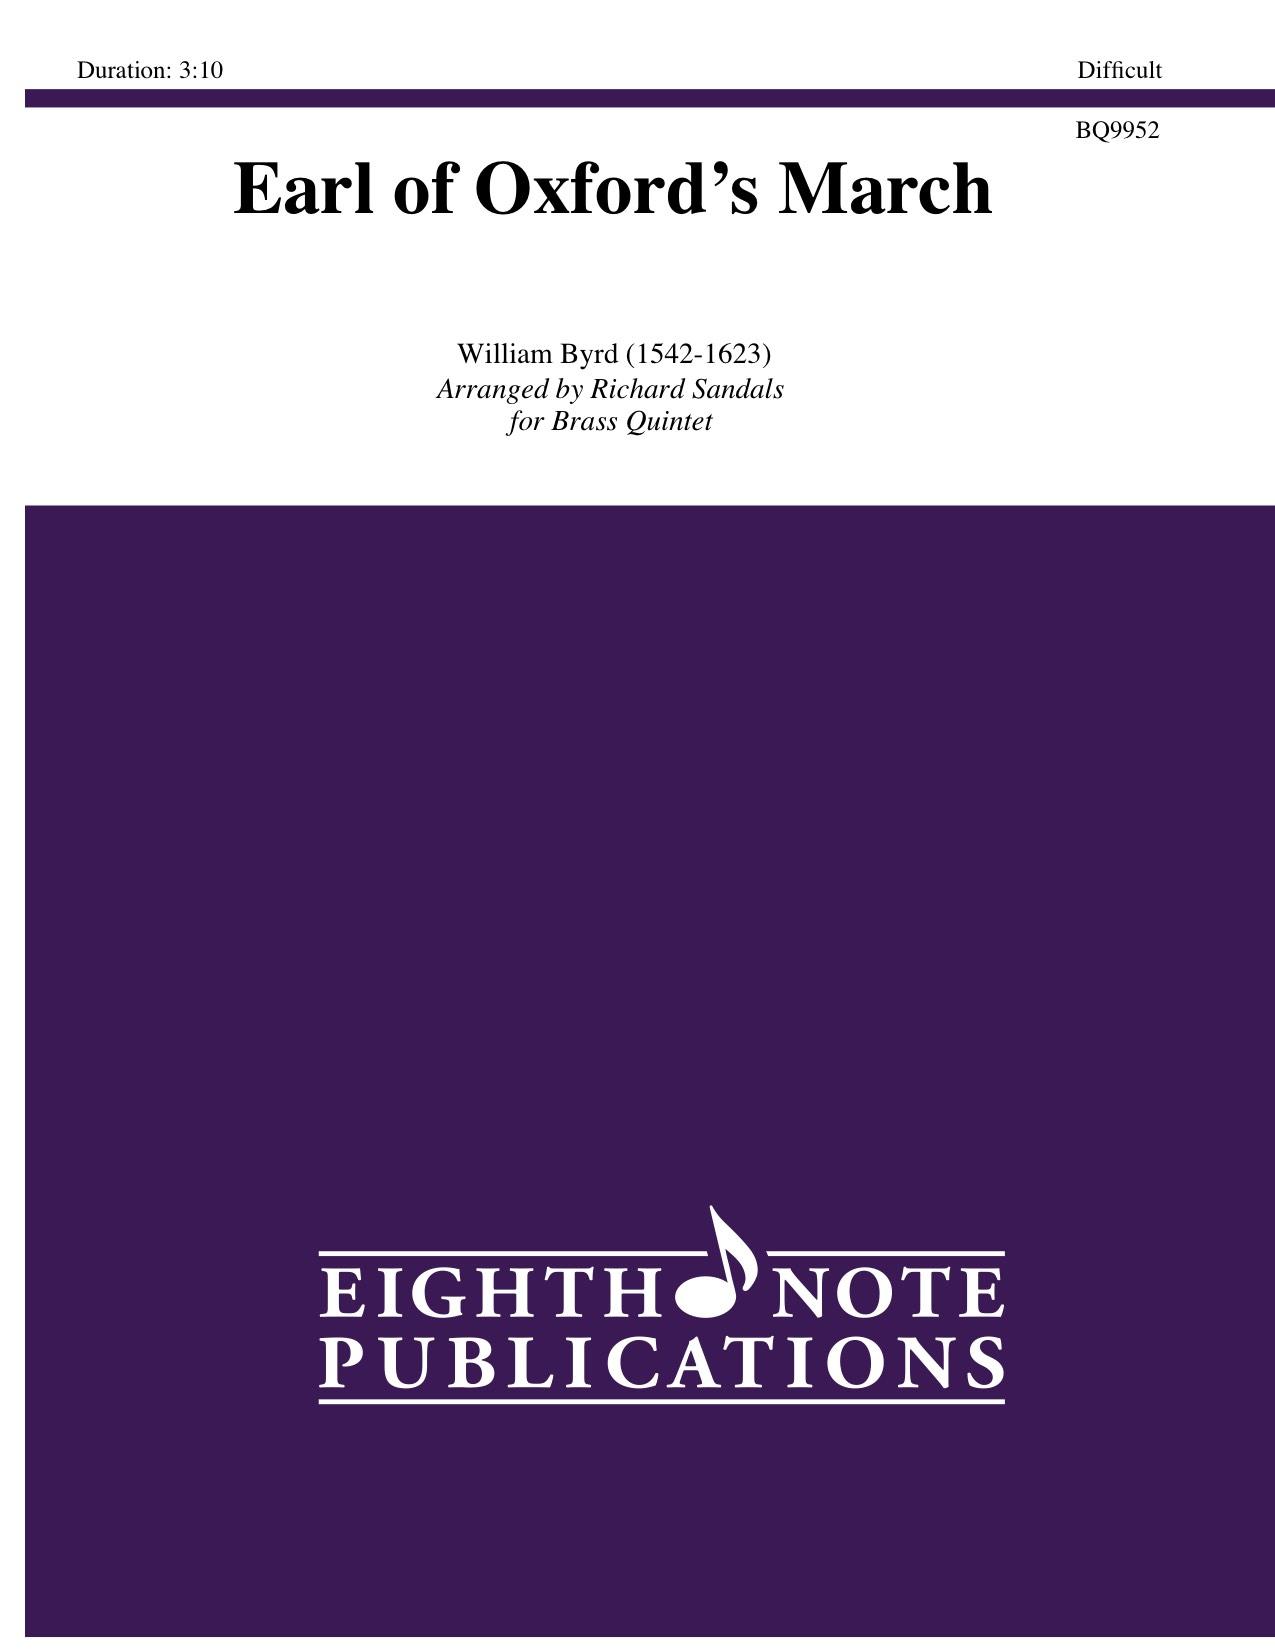 Earl of Oxfords March - William Byrd